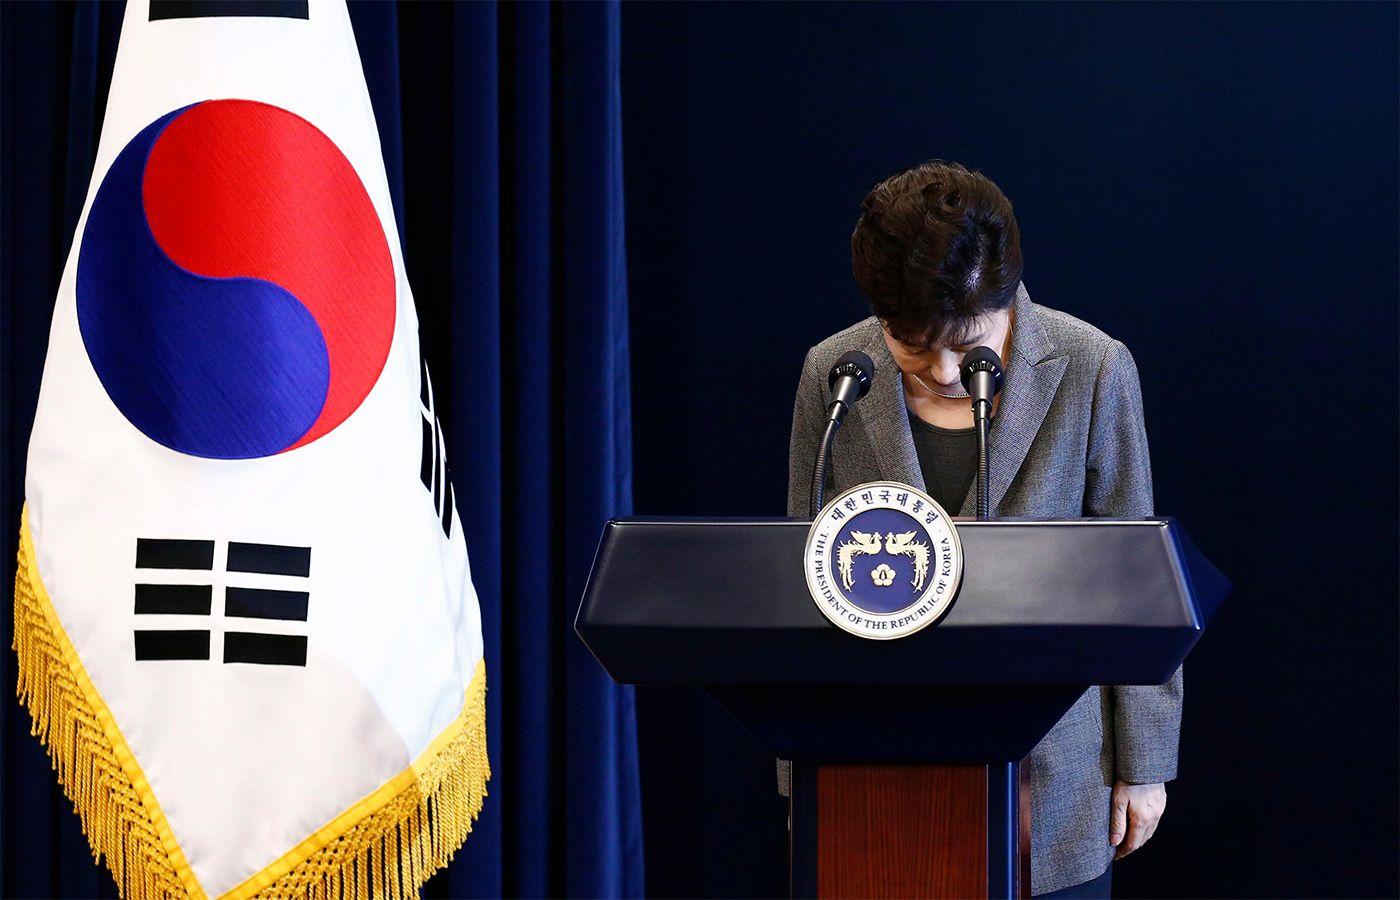 Экс-президента Южной Кореи поместили под арест- Kapital.kz